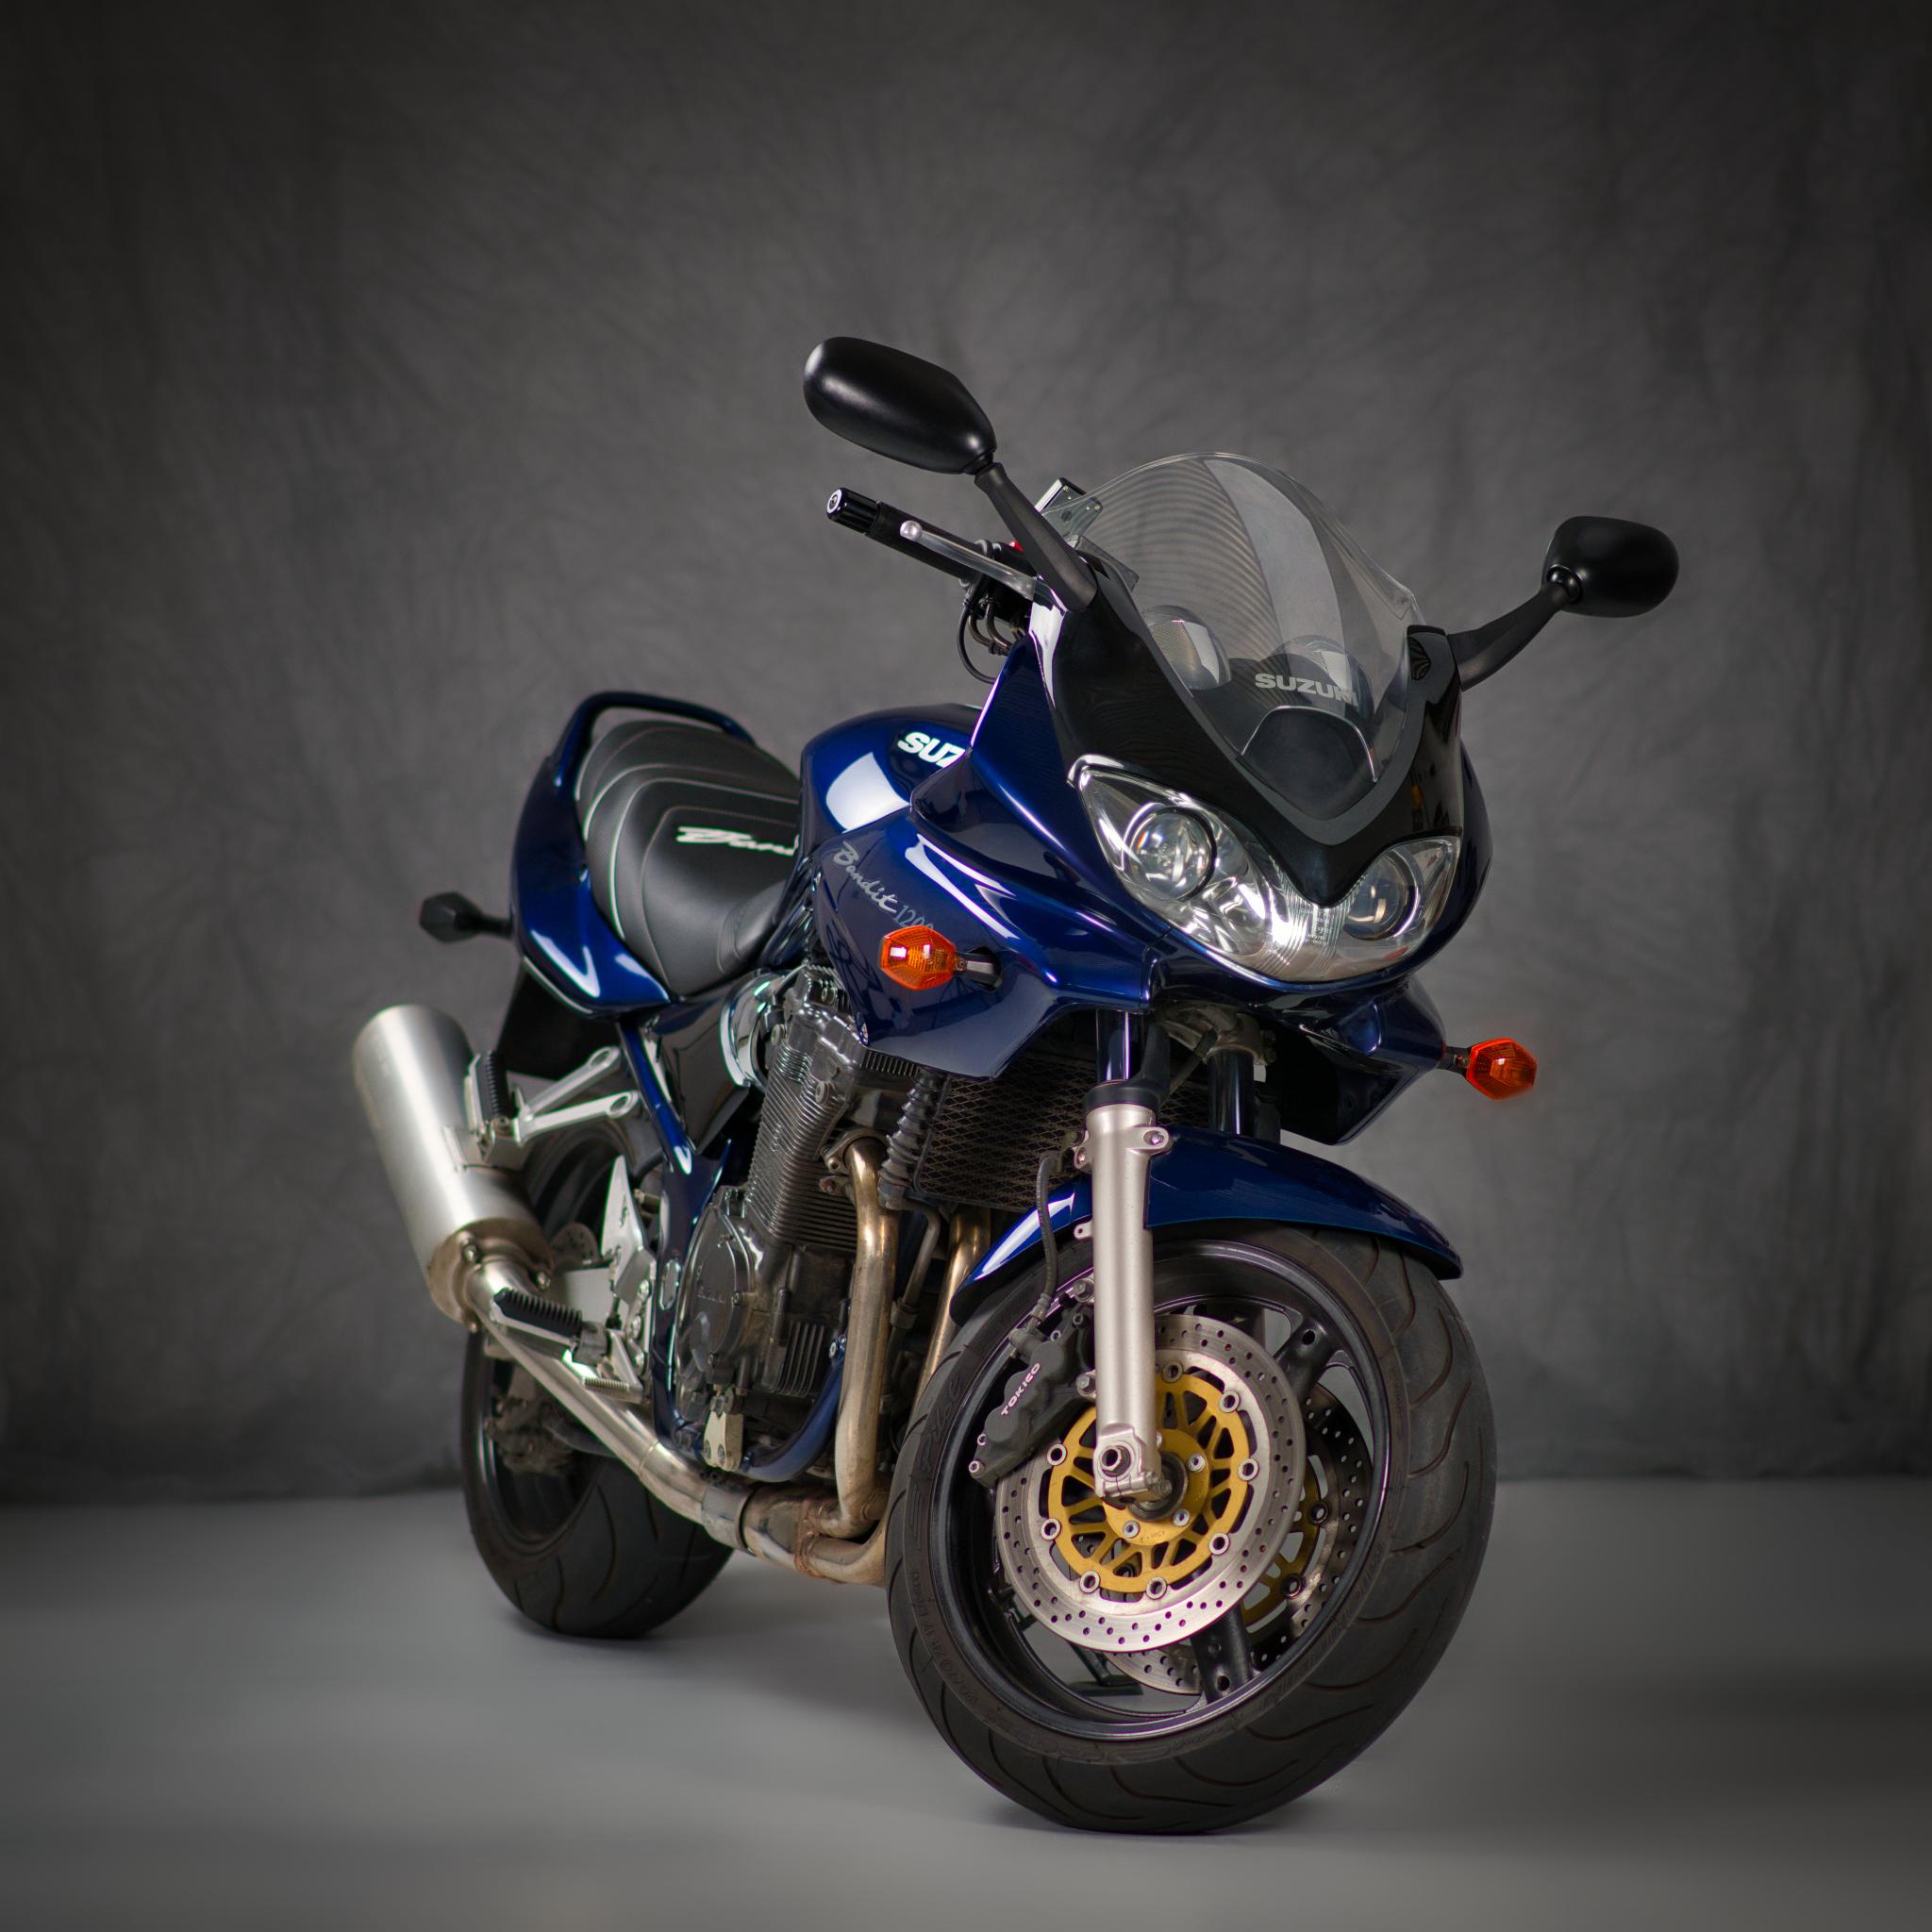 Suzuki Bandit 1200S Studio